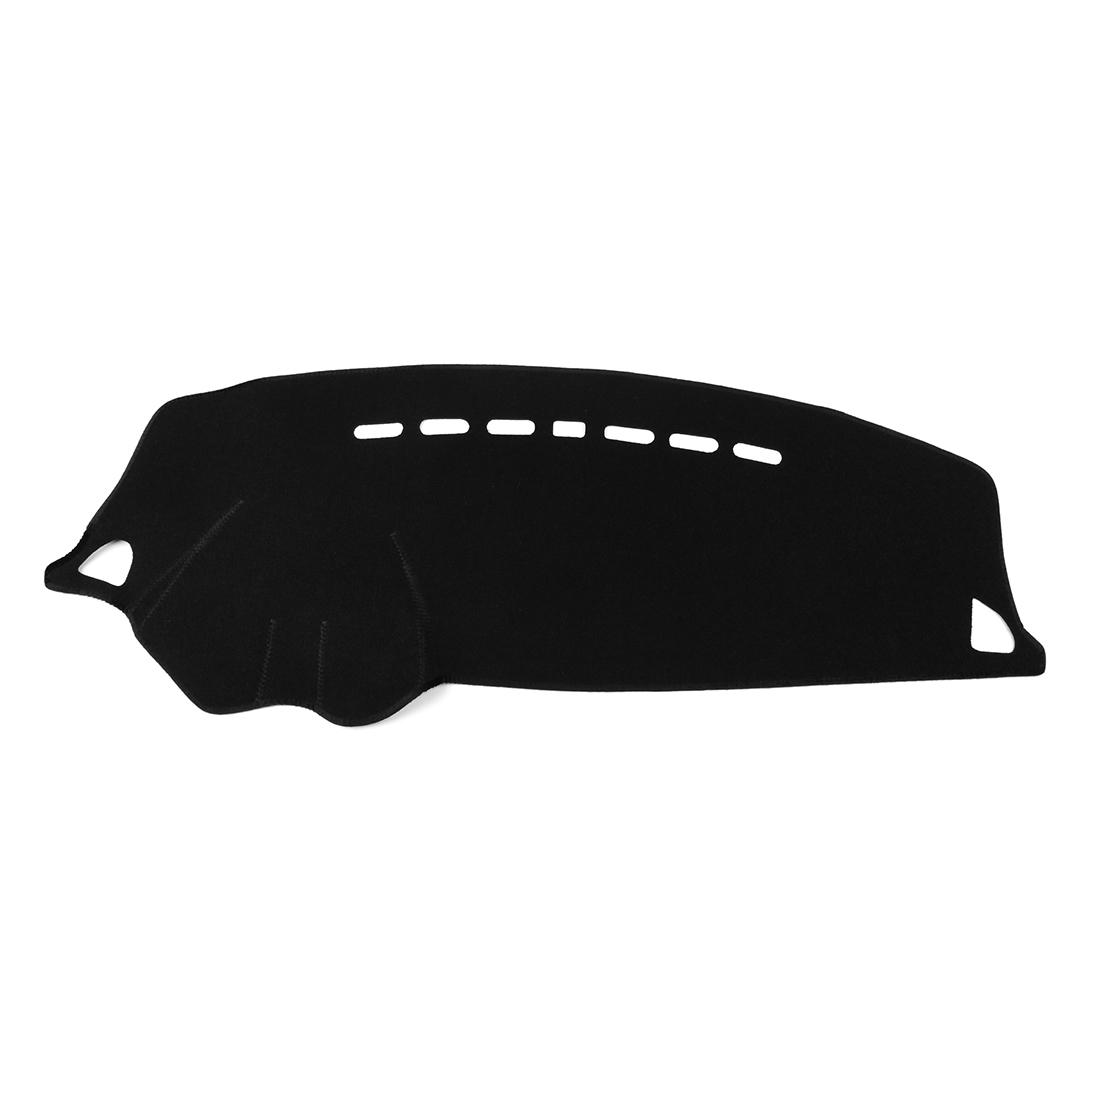 Car Dashboard Cover Nonslip Black Dash Mat Pad for 08-17 Mitsubishi Lancer EX